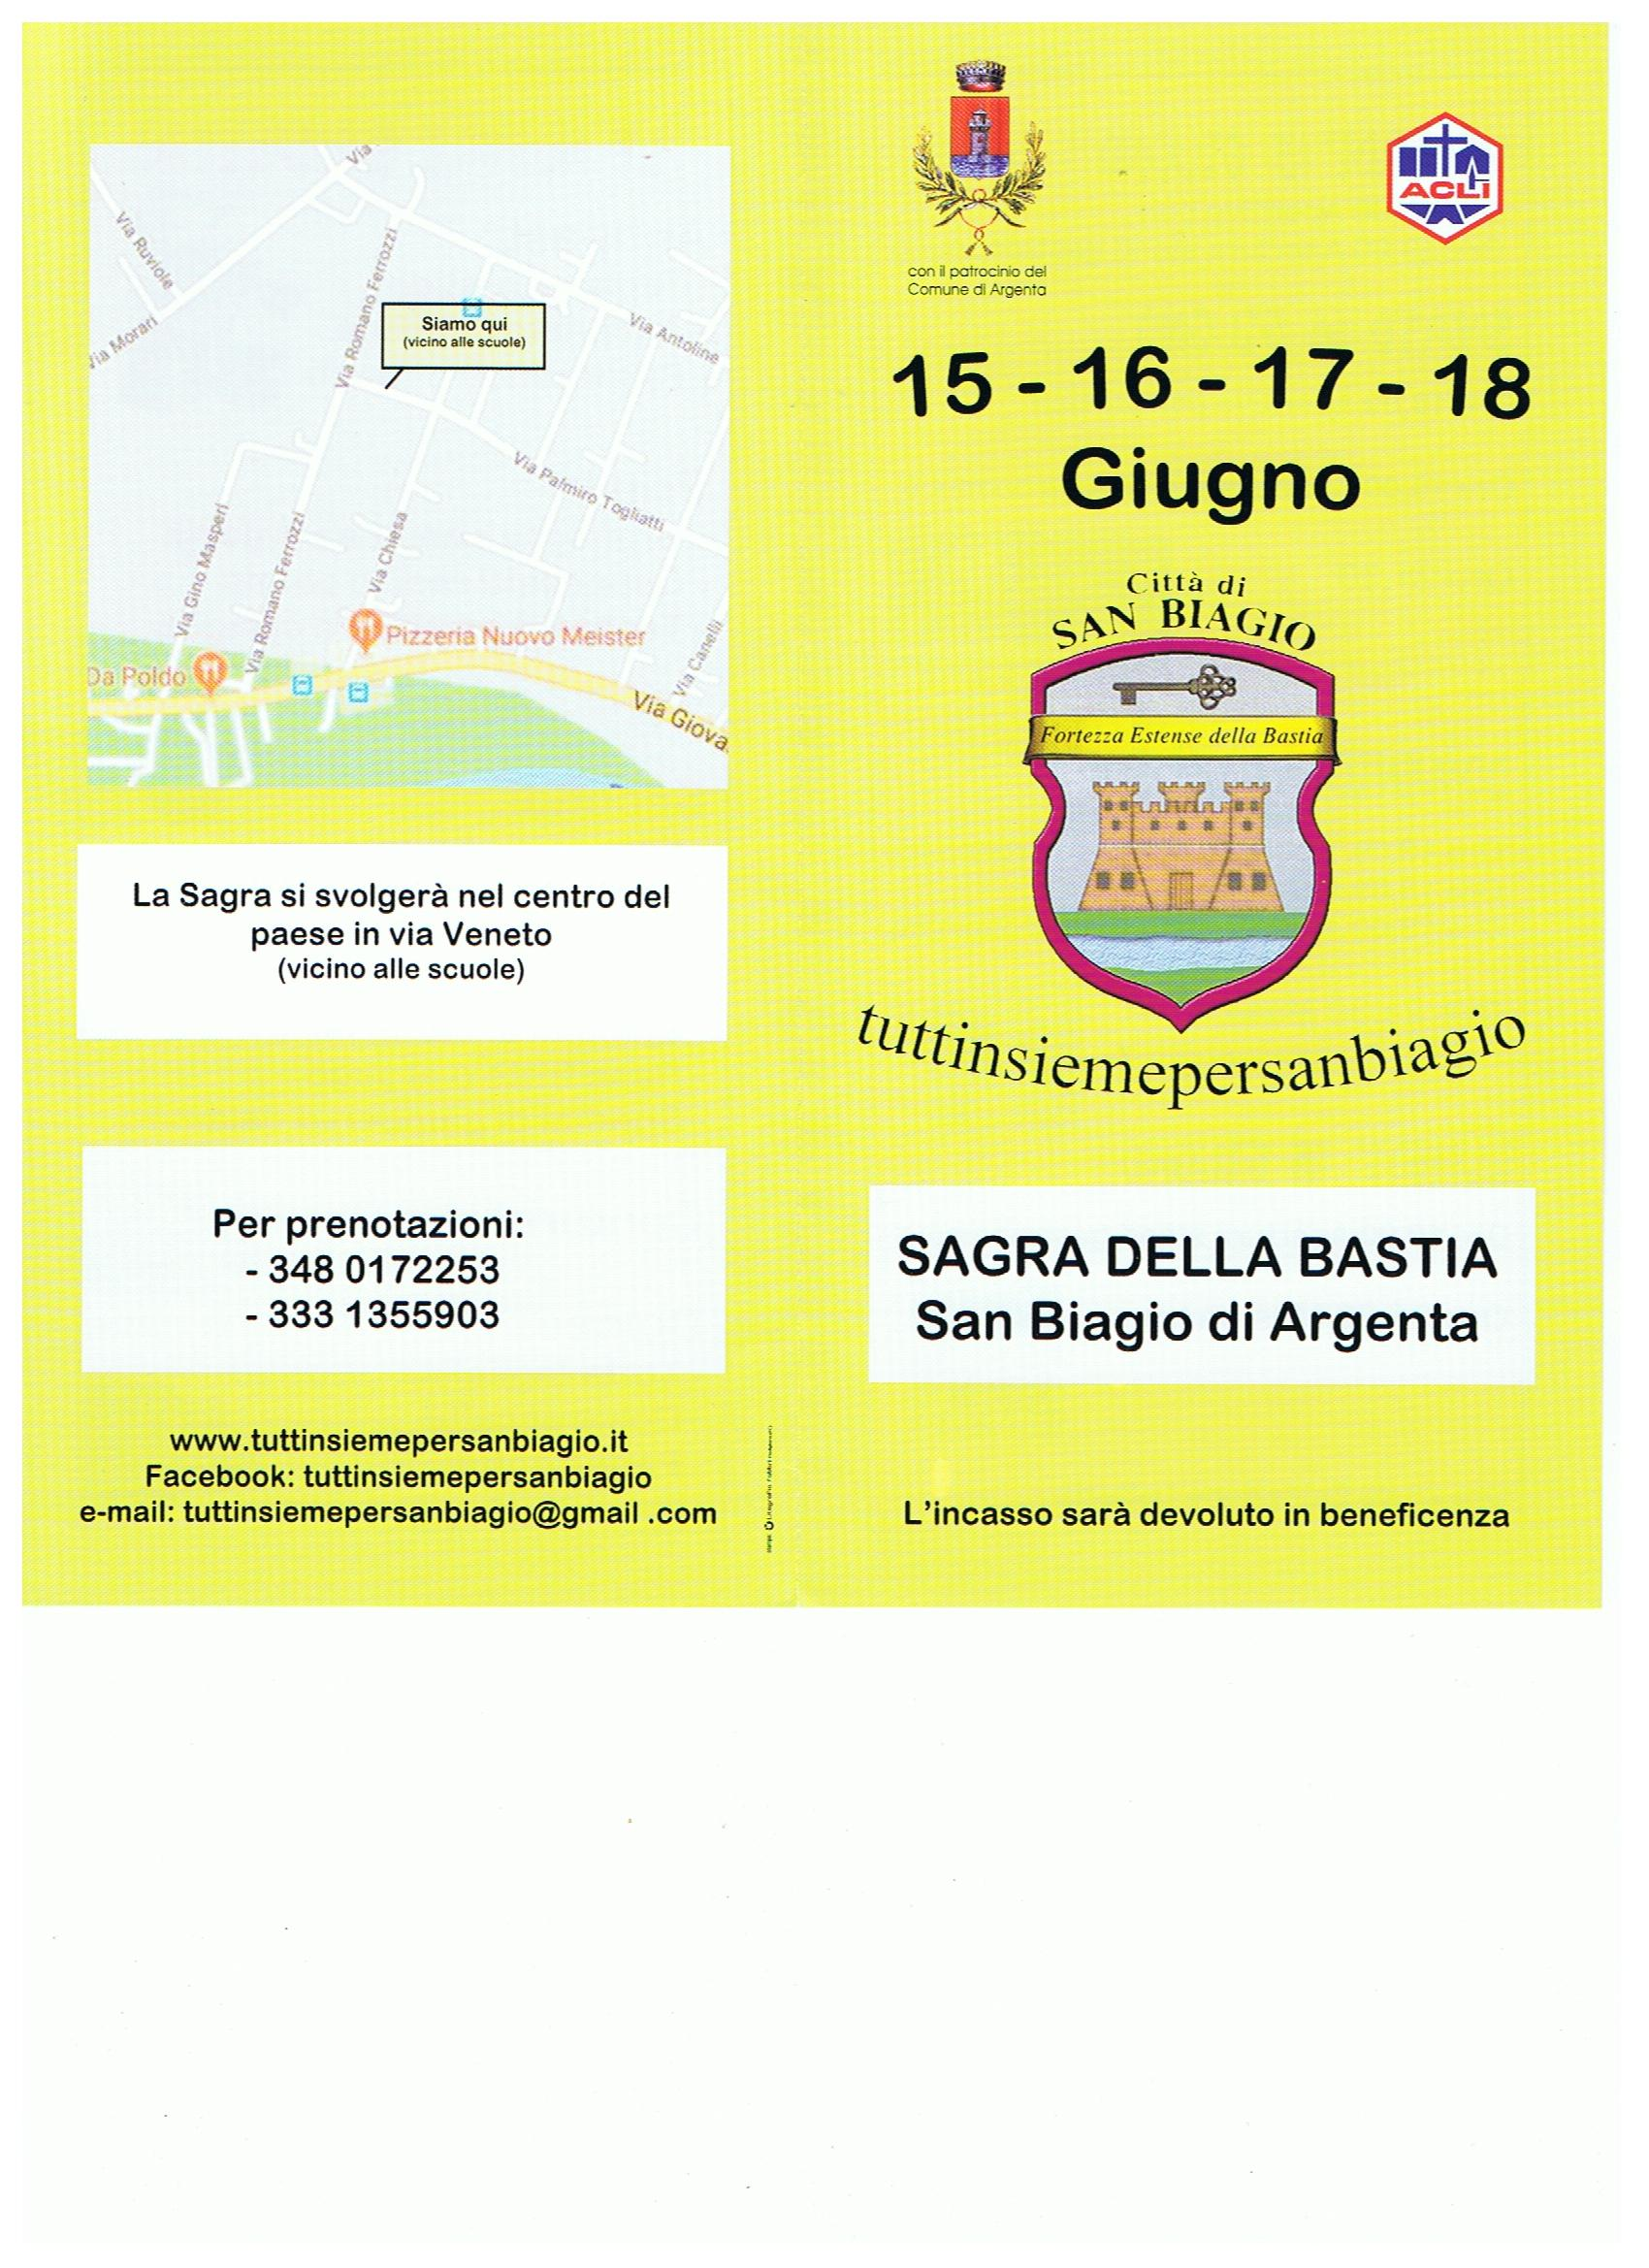 Volantino-1-Sagra-2018